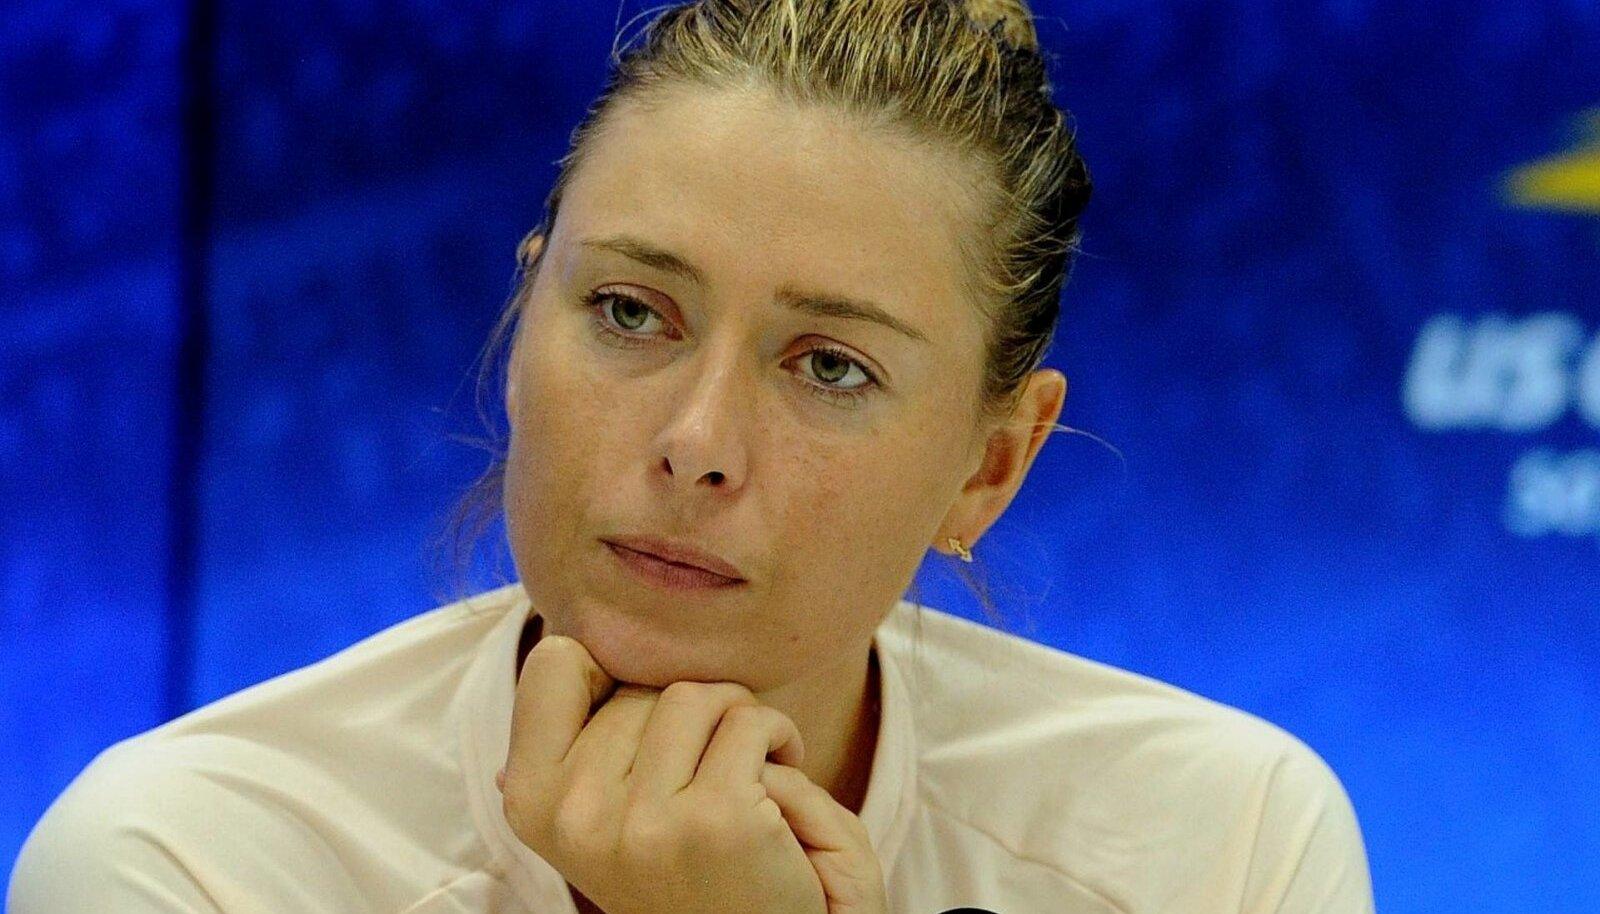 US open 2018 Maria Sharapova Russie TENNIS US Open 03 09 2018 chryslenecaillaud PUBLICATION